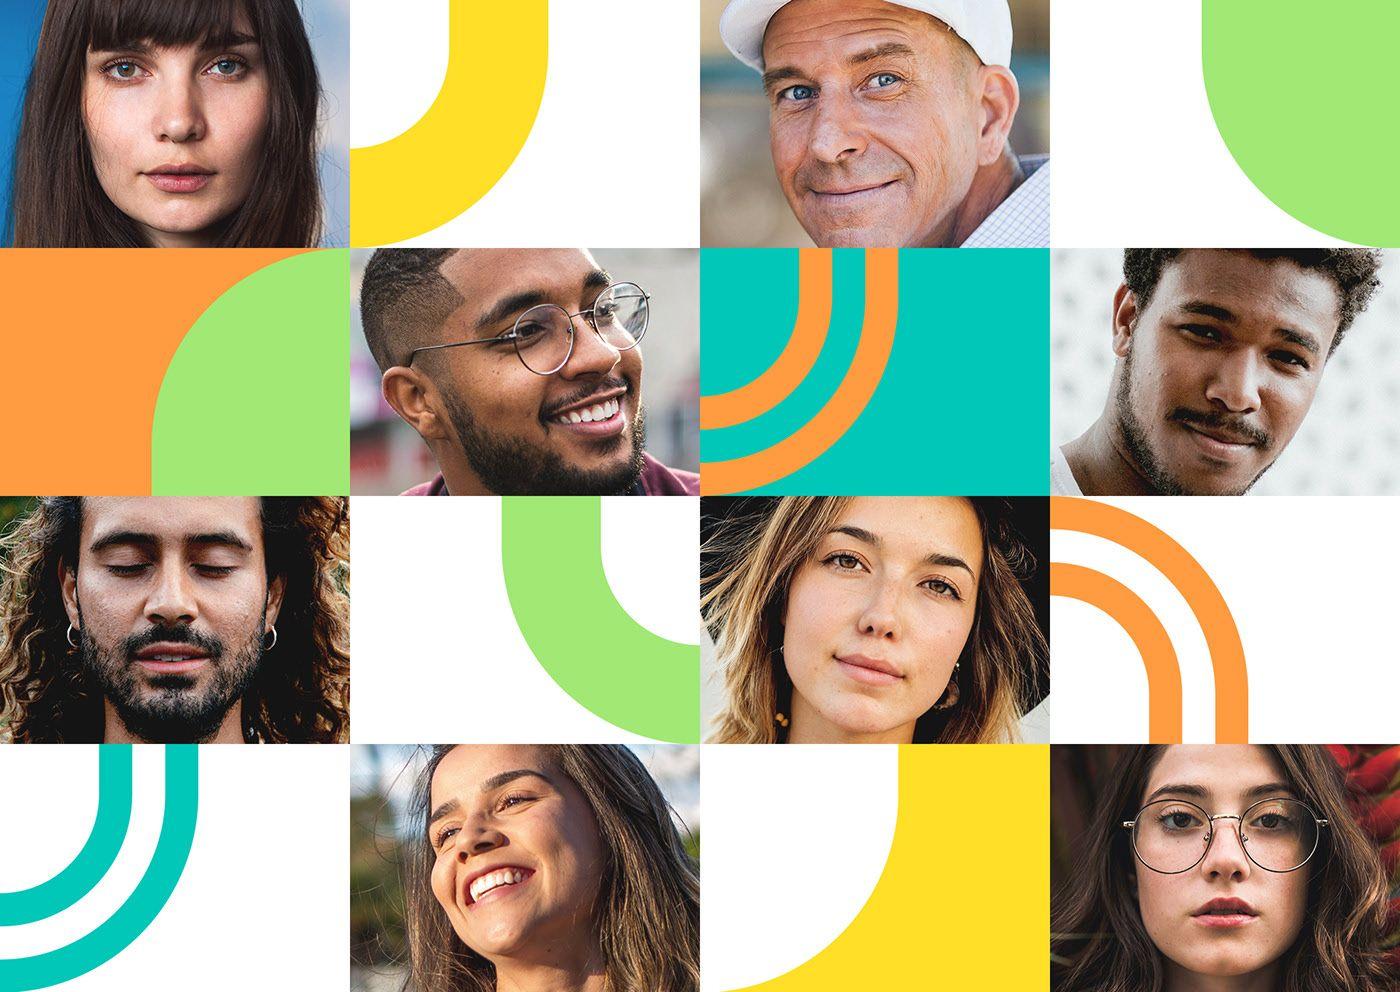 Grafismo com Imagem HumansApp in 2020 Social media